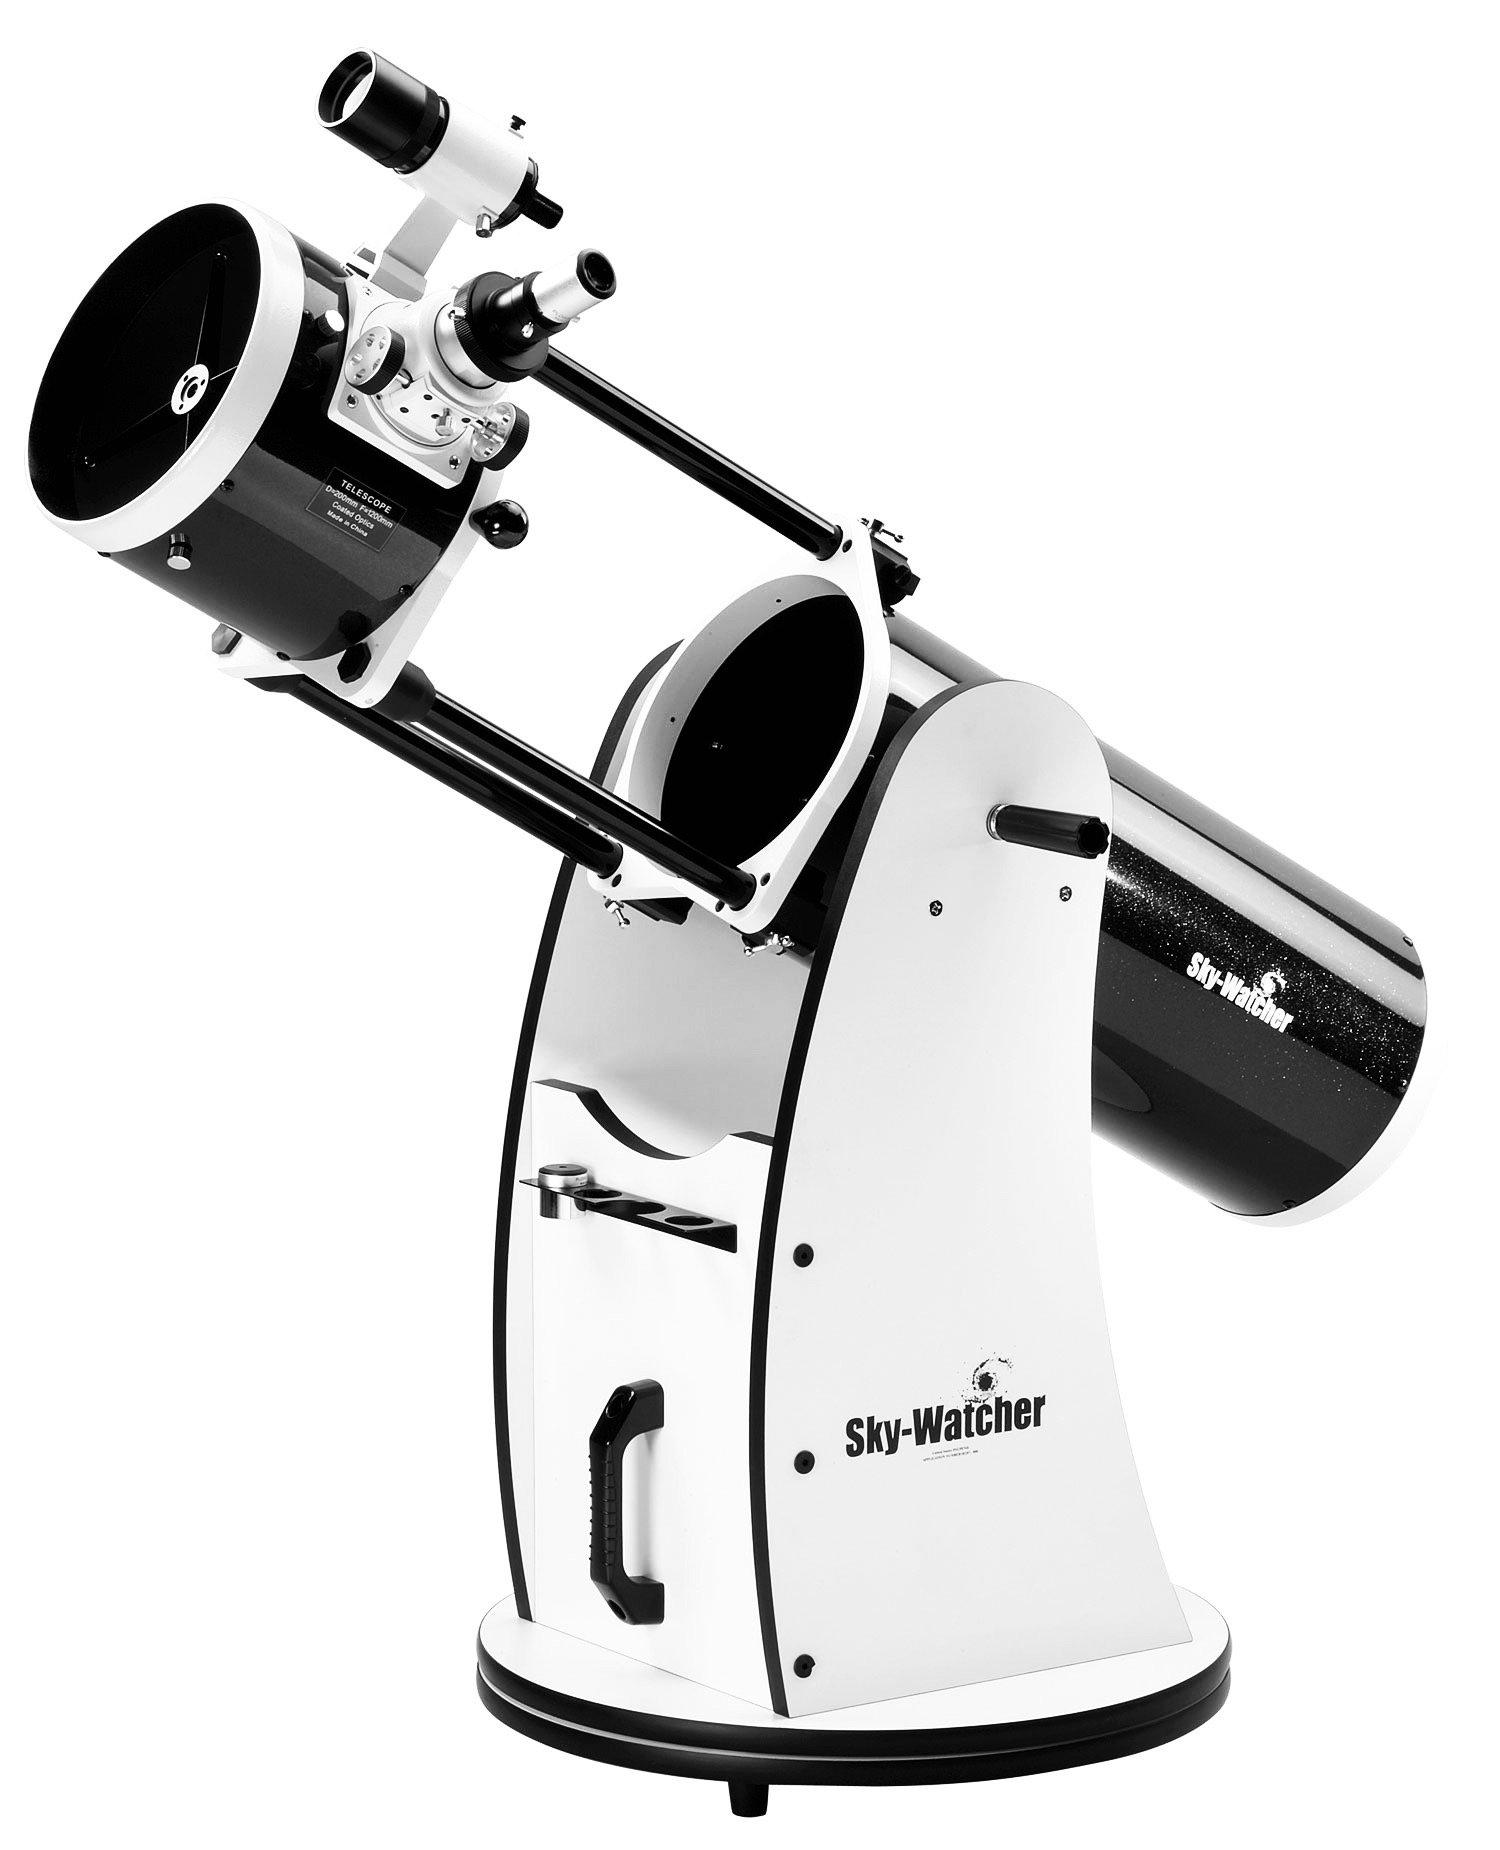 "skywatcher 8"" collapsible dobsonian telescope"